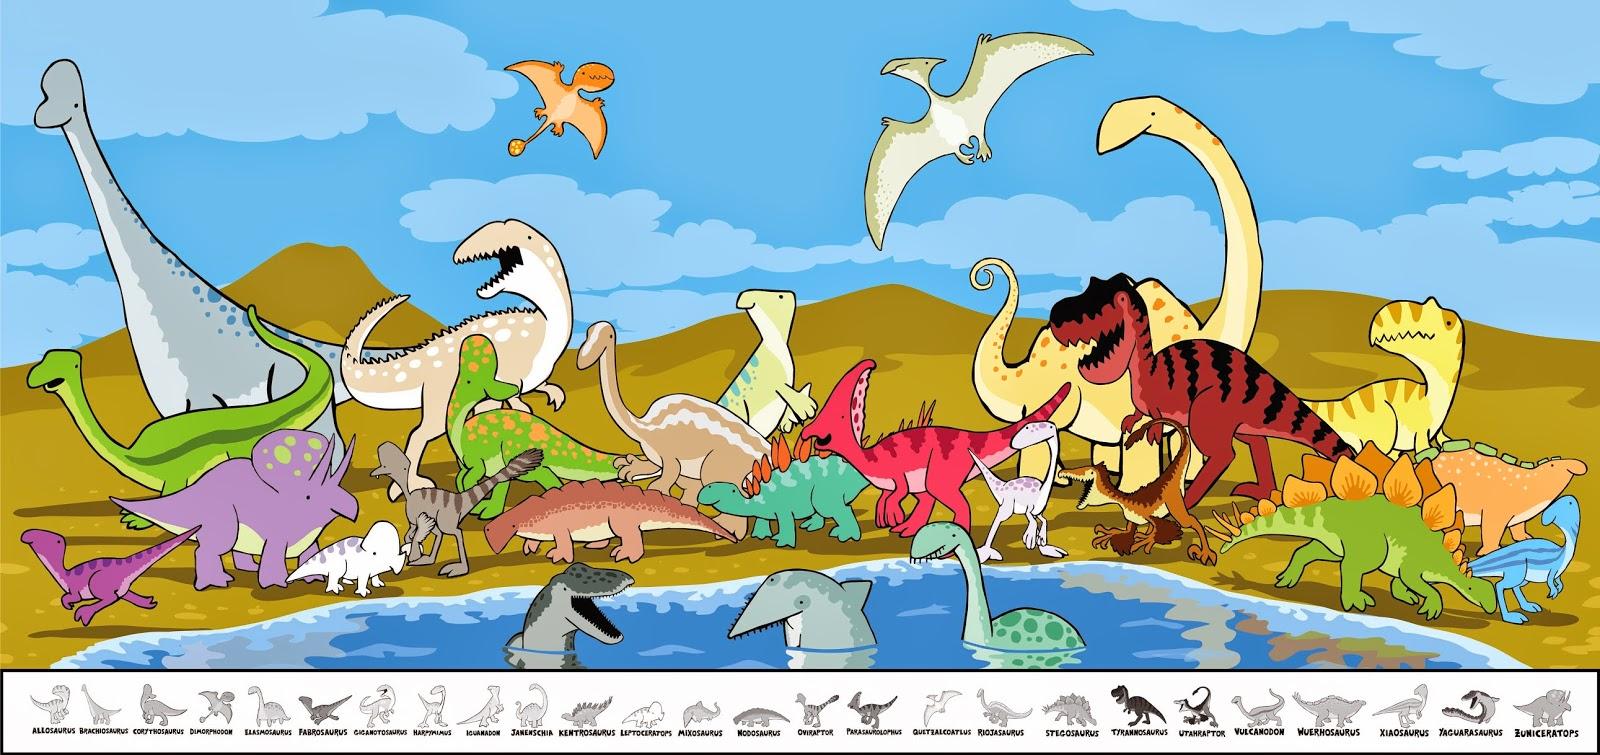 Allosaurus Brachiosaurus Corythosaurus Dimorphodon Elasmosaurus Fabrosaurus Giganotosaurus Harpymimus Iguanadon Janenschia Kentrosaurus Leptoceratops Mixosaurus Nodosaurus Oviraptor Parasaurolophus Quetzalcoatlus Riojasaurus Stegosaurus Tyrannosaurus Utahraptor Vulcanodon Wuerhosaurus Xiaosaurus Yaguarasaurus Zuniceratops